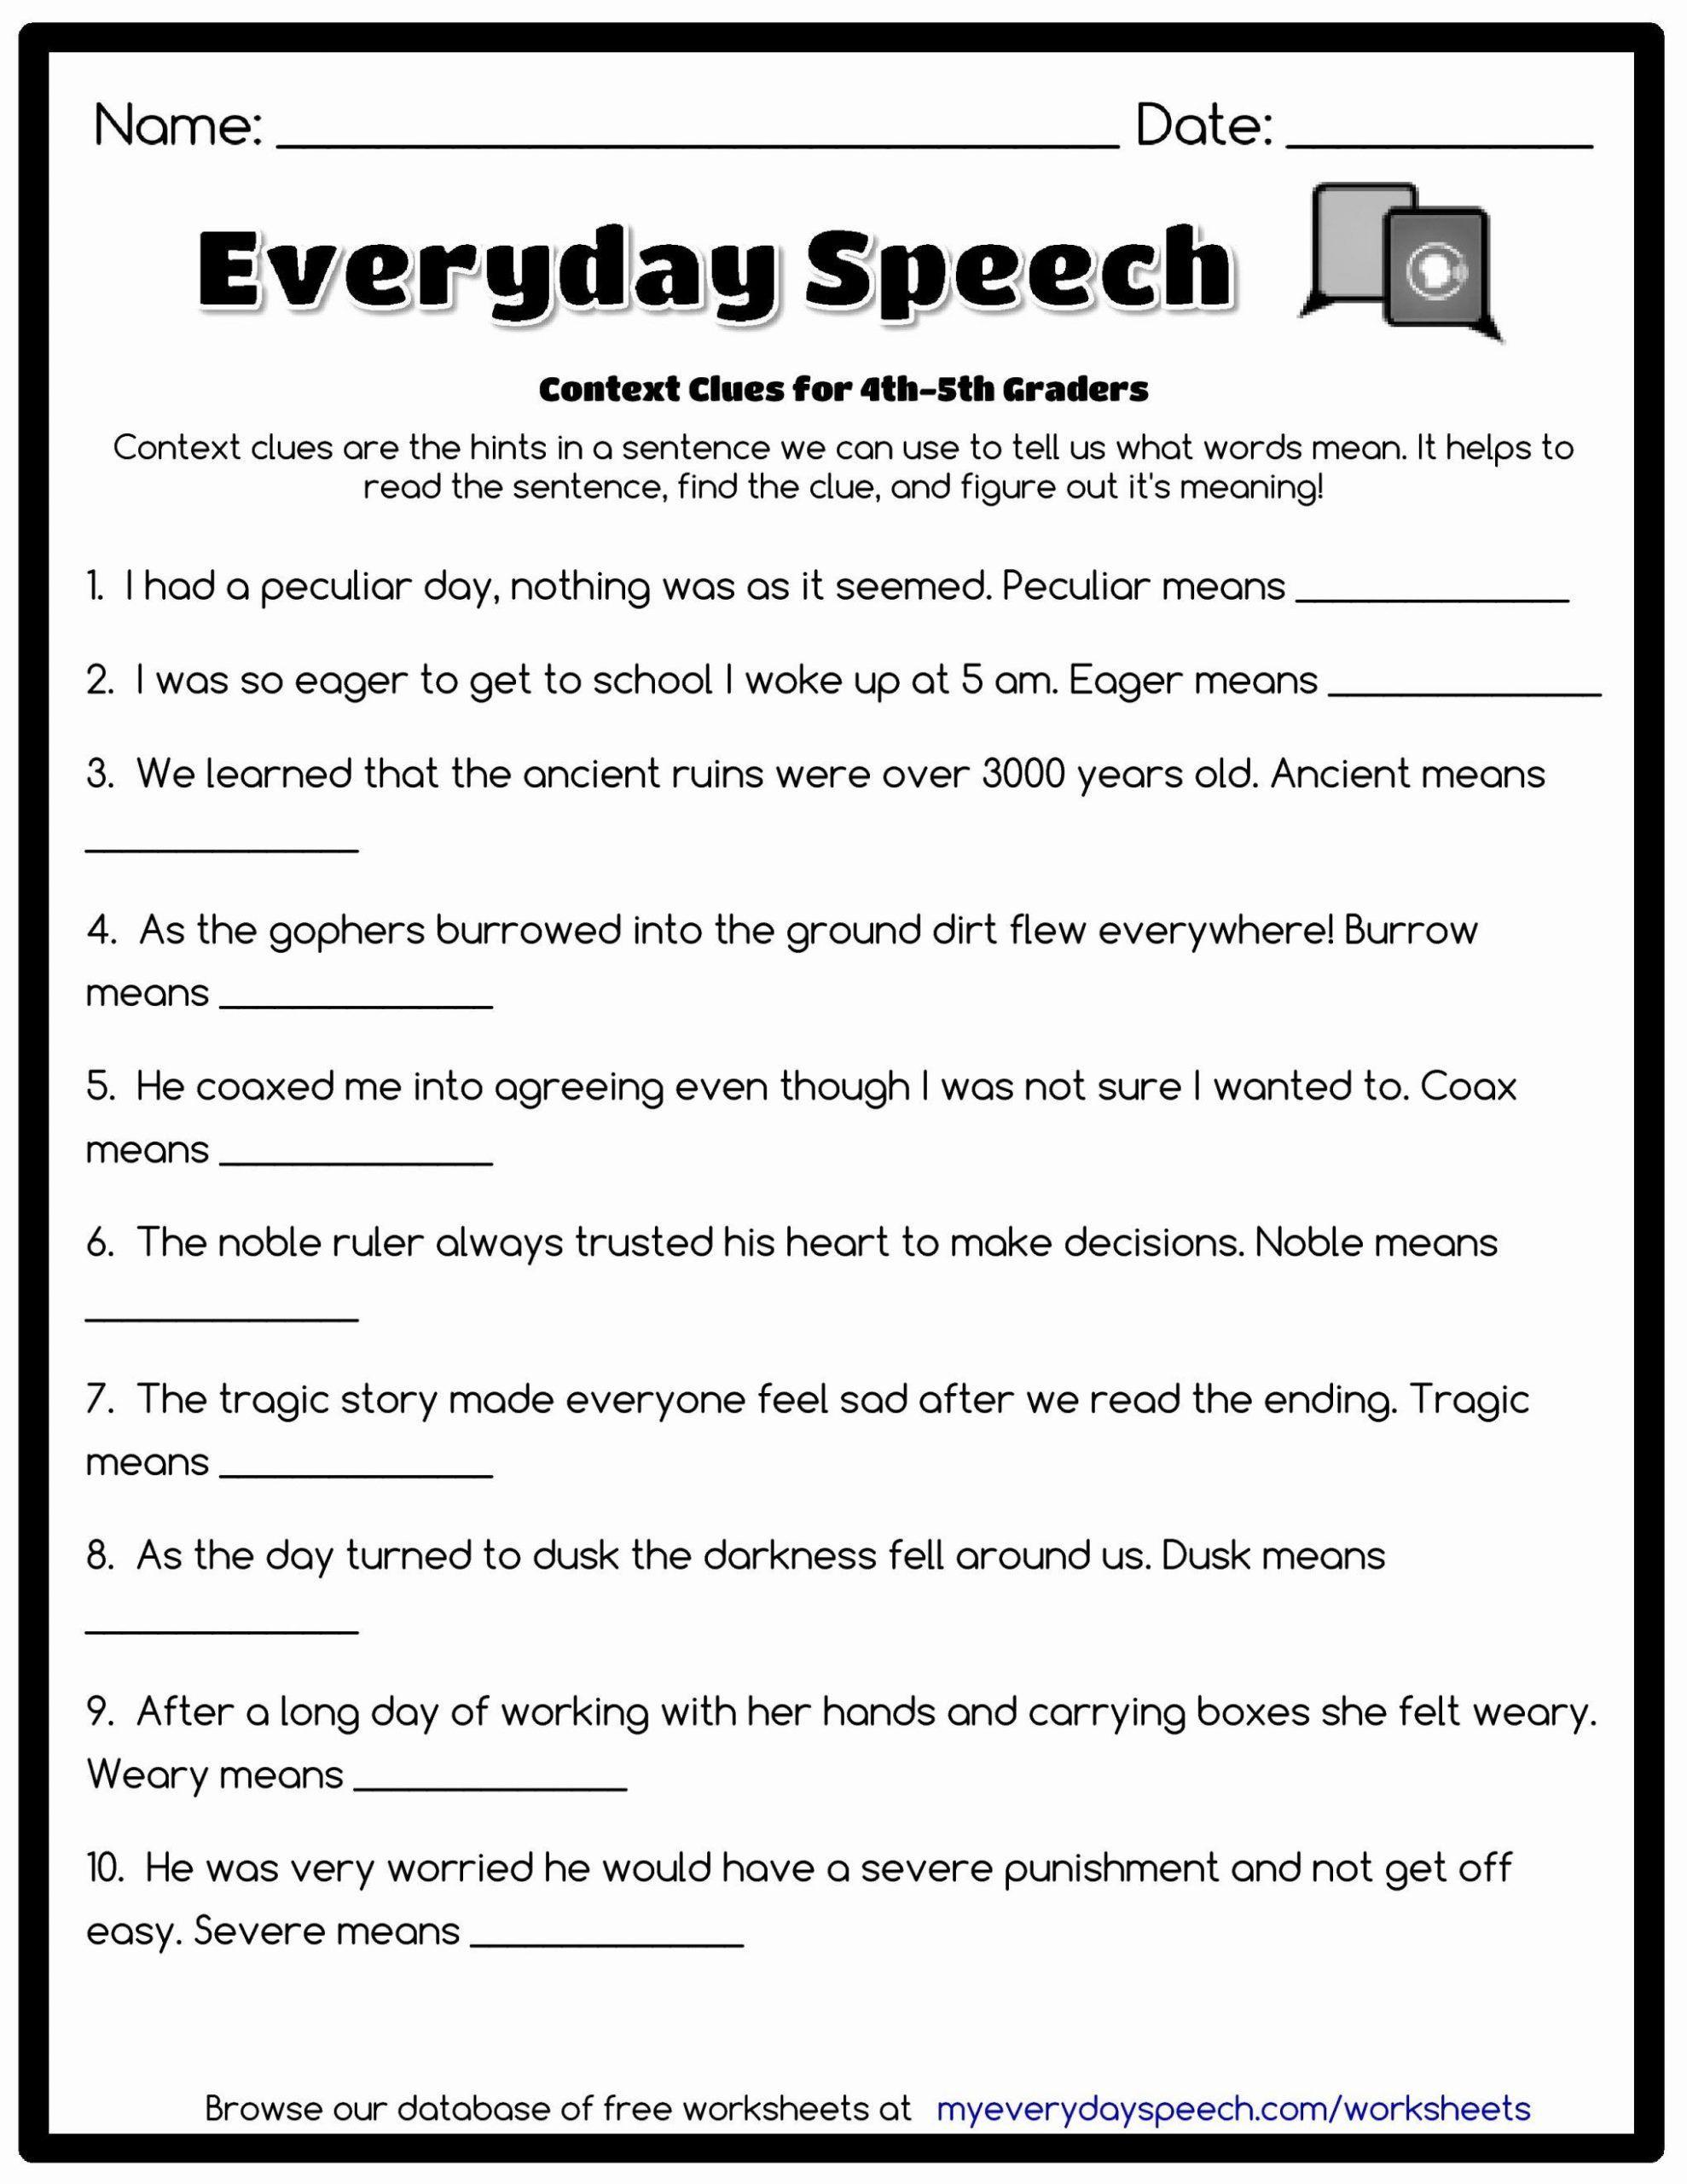 Grammar Worksheet 3rd Grade Grammar Worksheet 3rd Grade In